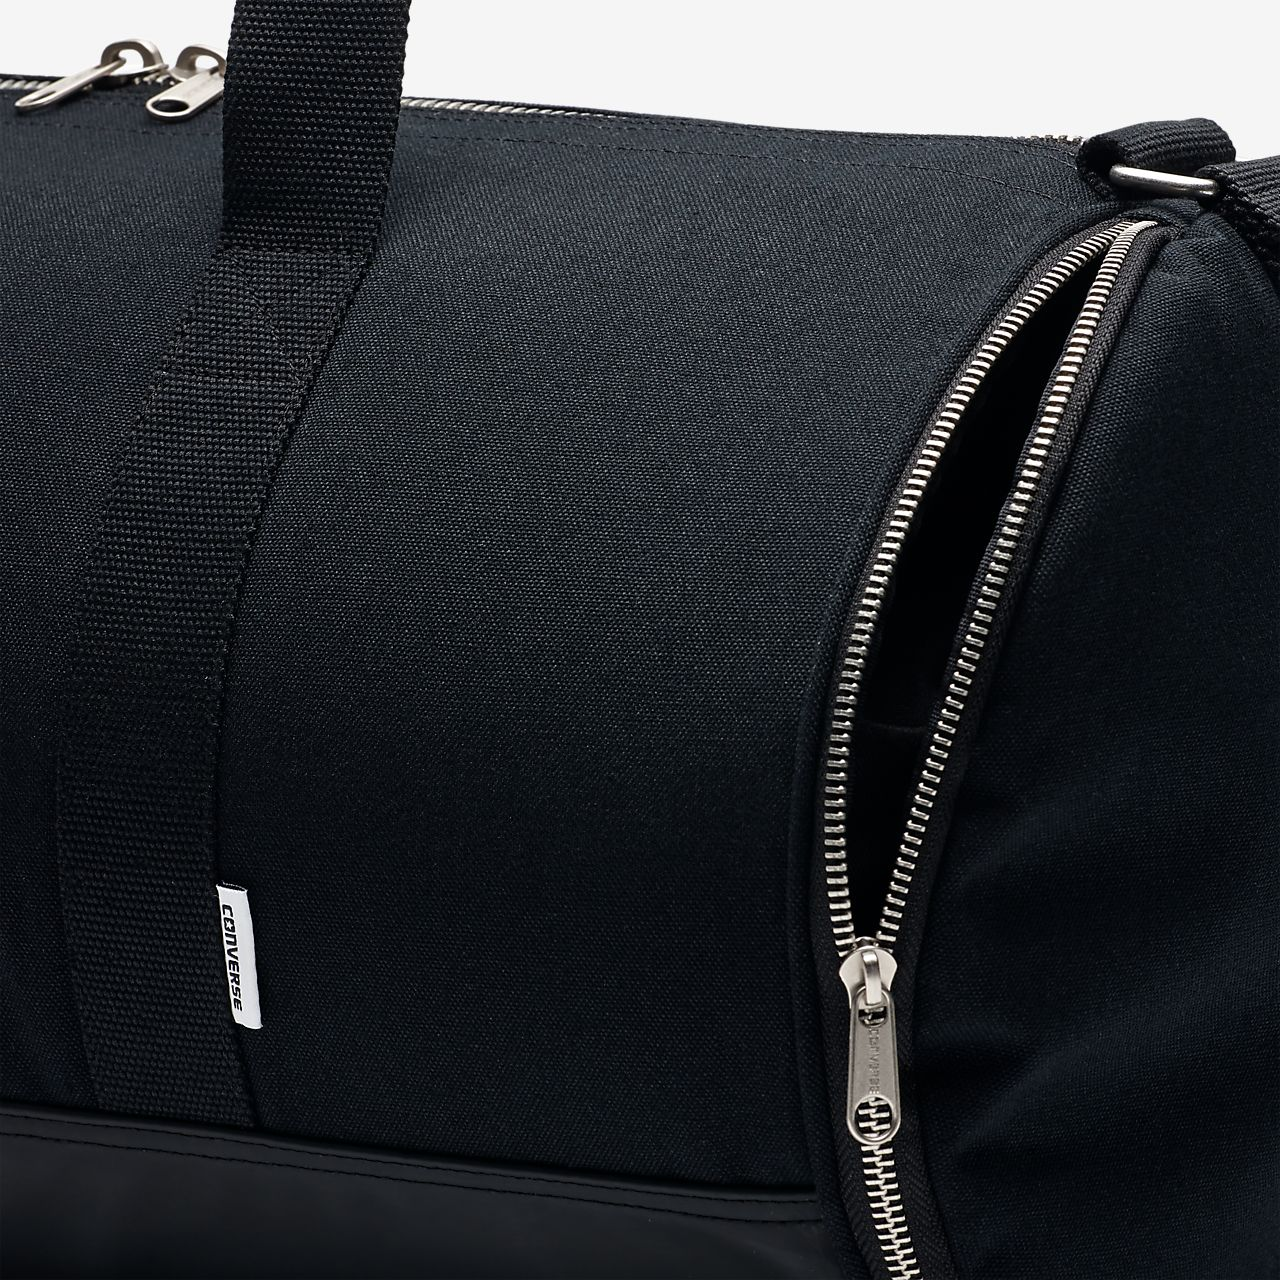 converse canvas bag Sale 6aae28566933c